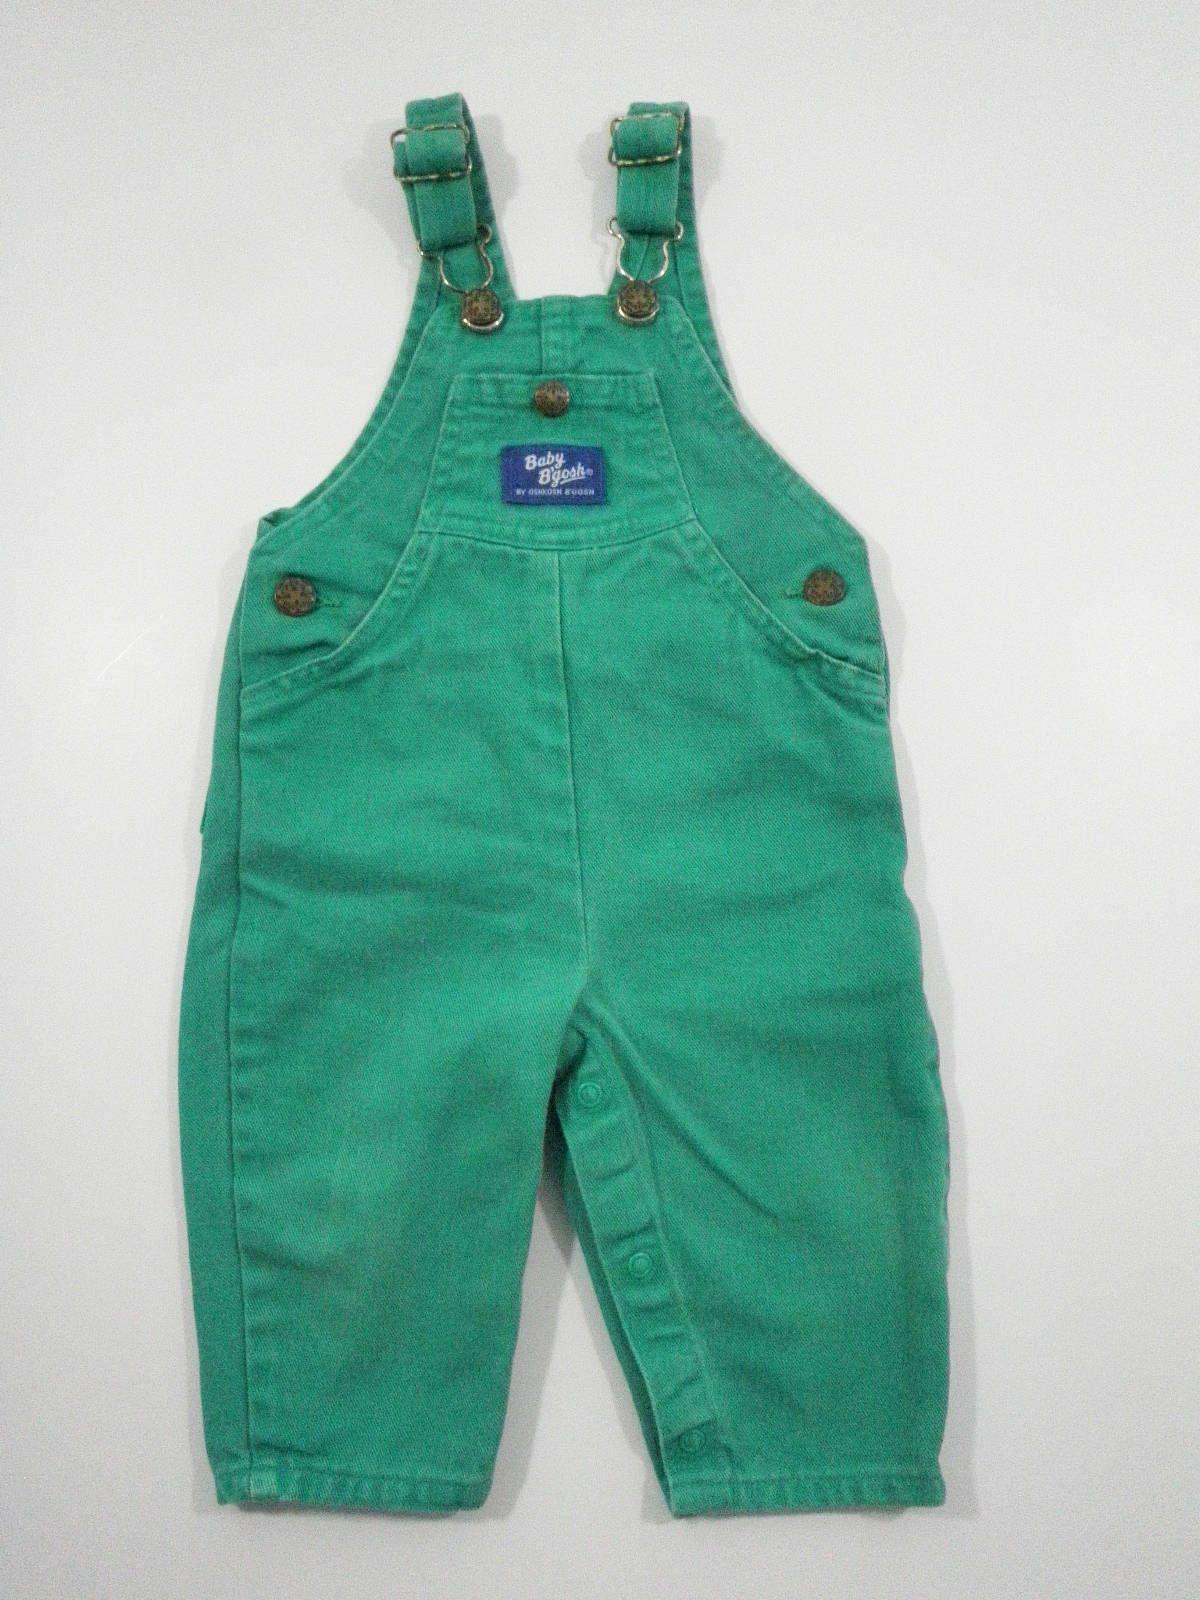 Oshkosh Bgosh Green Denim Bib Overalls Baby Boy Girl 12m Vestbak Denim Jeans Vintage Made In The Usa By Tr Vintage Childrens Clothing Childrens Clothes Clothes